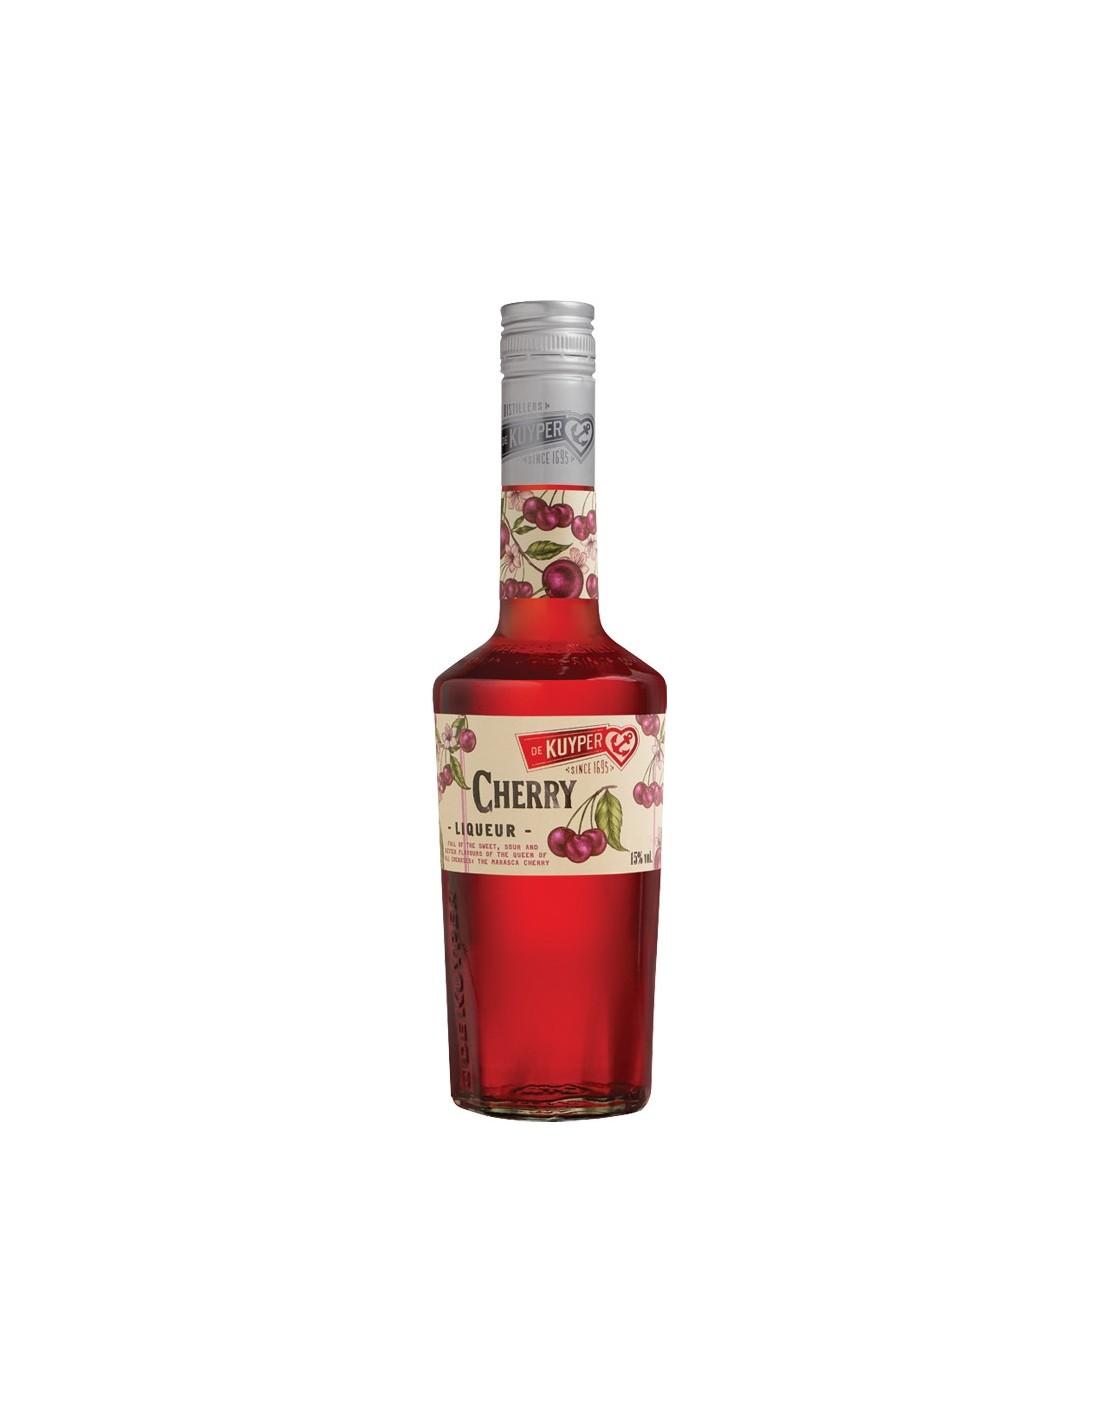 Lichior De Kuyper Cherry 0.7l